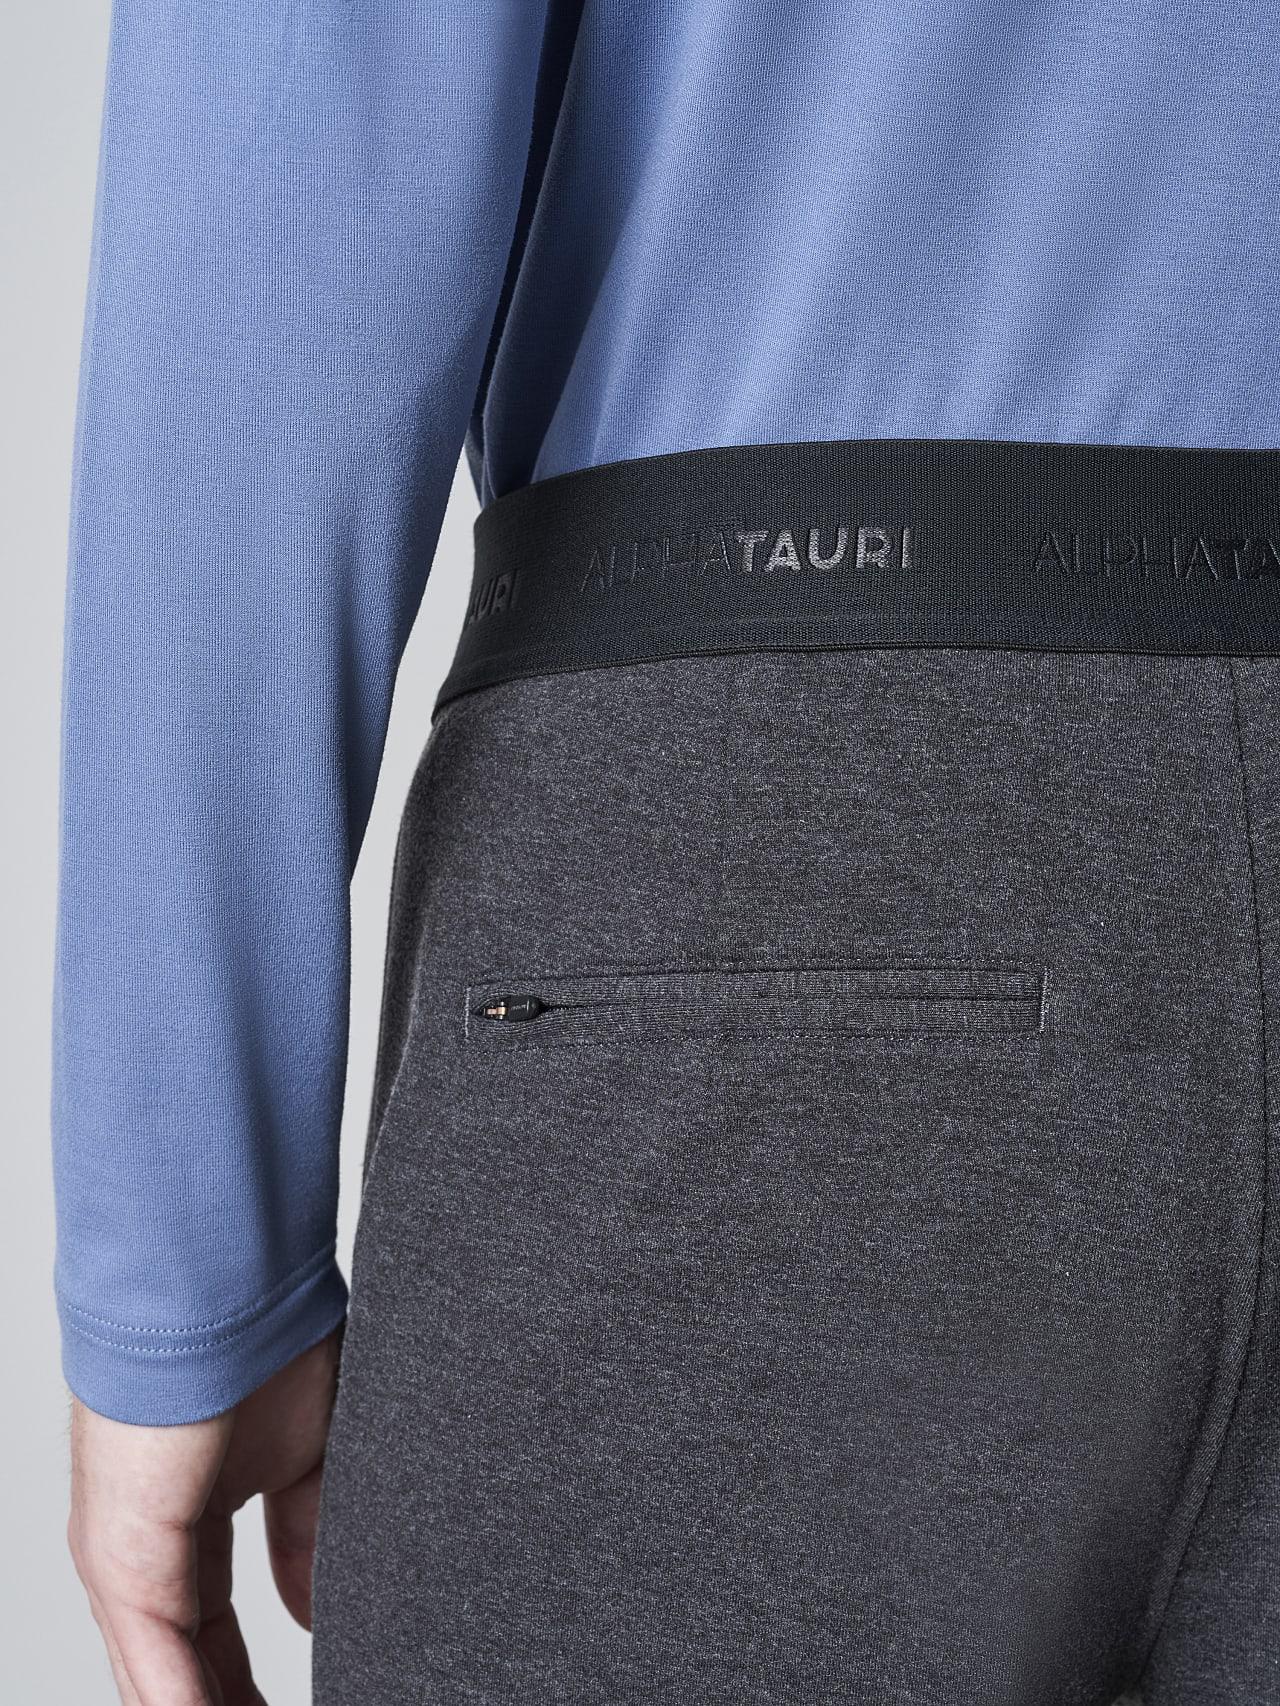 PRINO V2.Y5.02 Cropped Waterproof Sweat Pants dark grey / anthracite Front Alpha Tauri